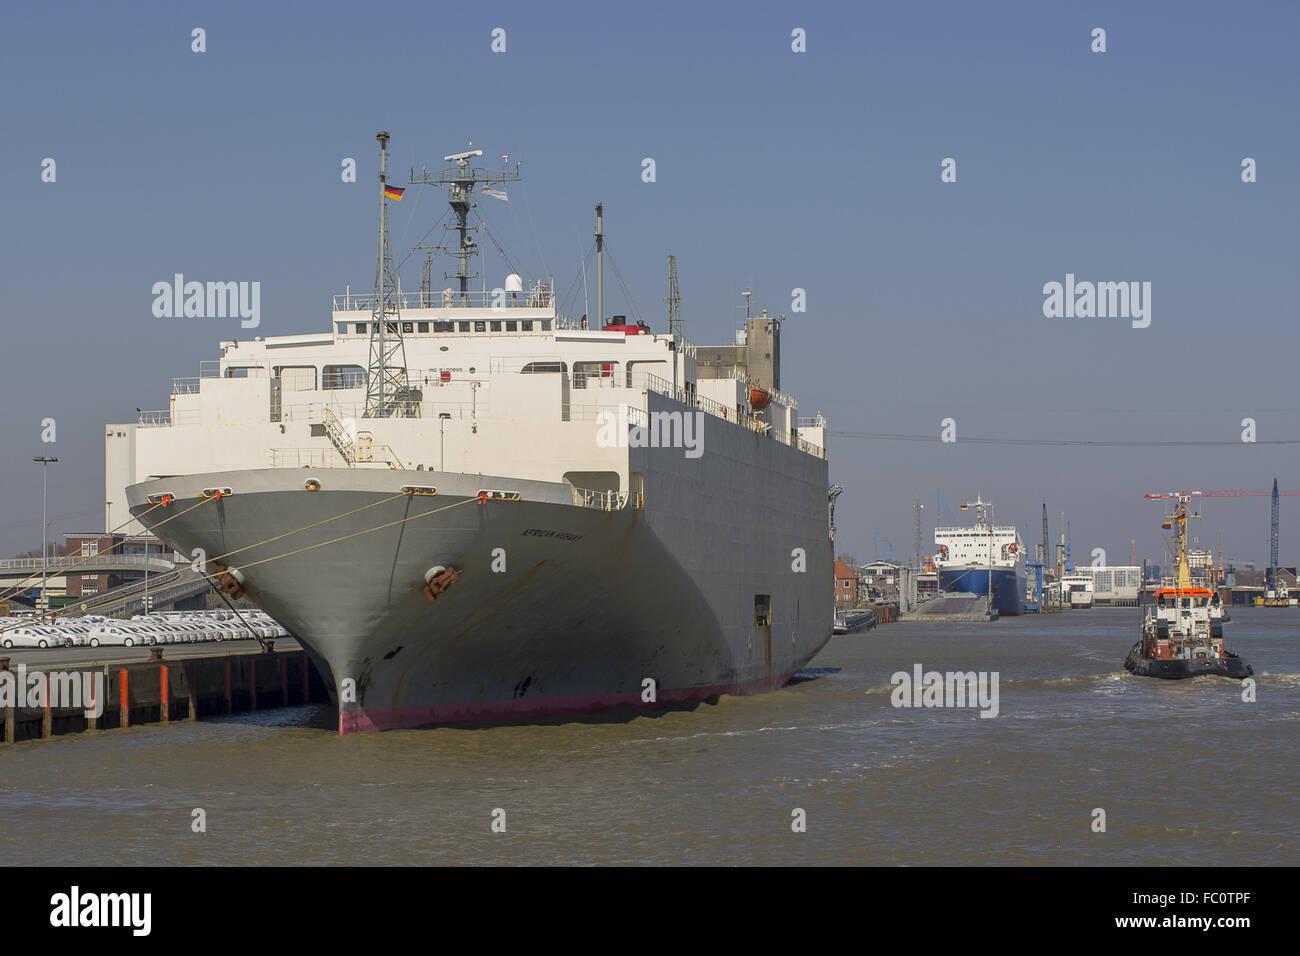 Ro-Ro ship African Highway - Stock Image